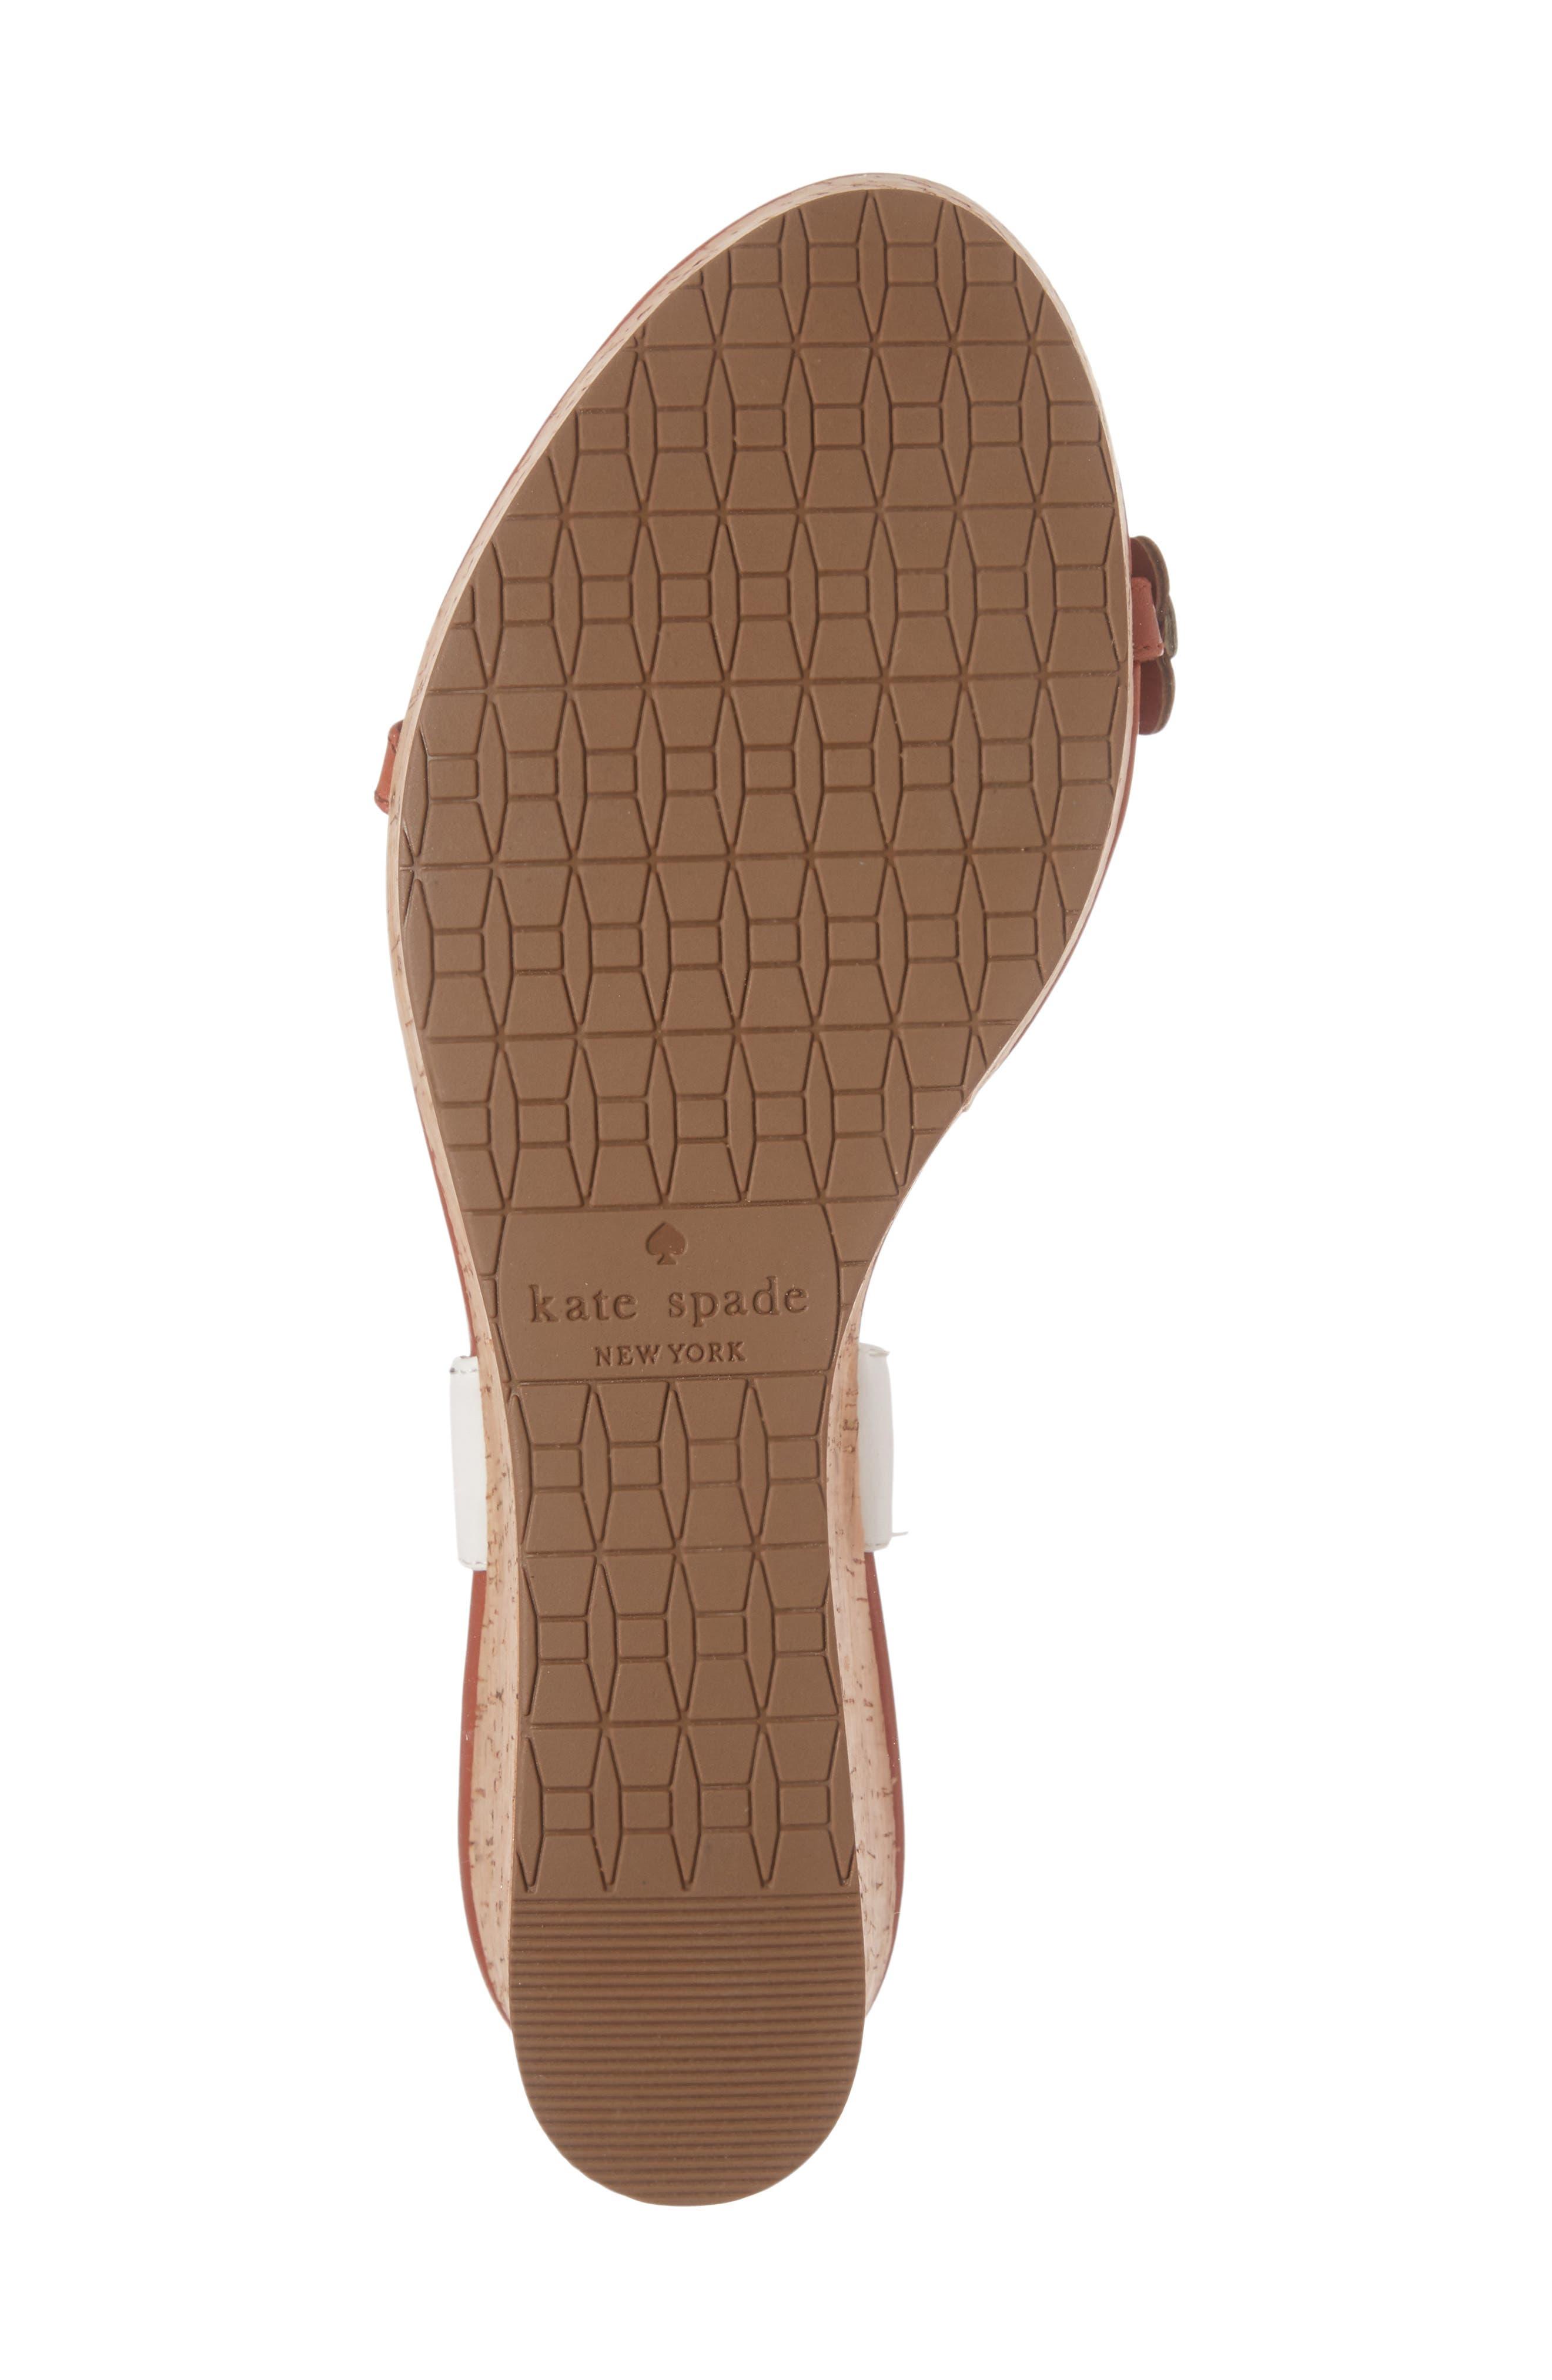 KATE SPADE NEW YORK, tisdale platform wedge sandal, Alternate thumbnail 6, color, 200